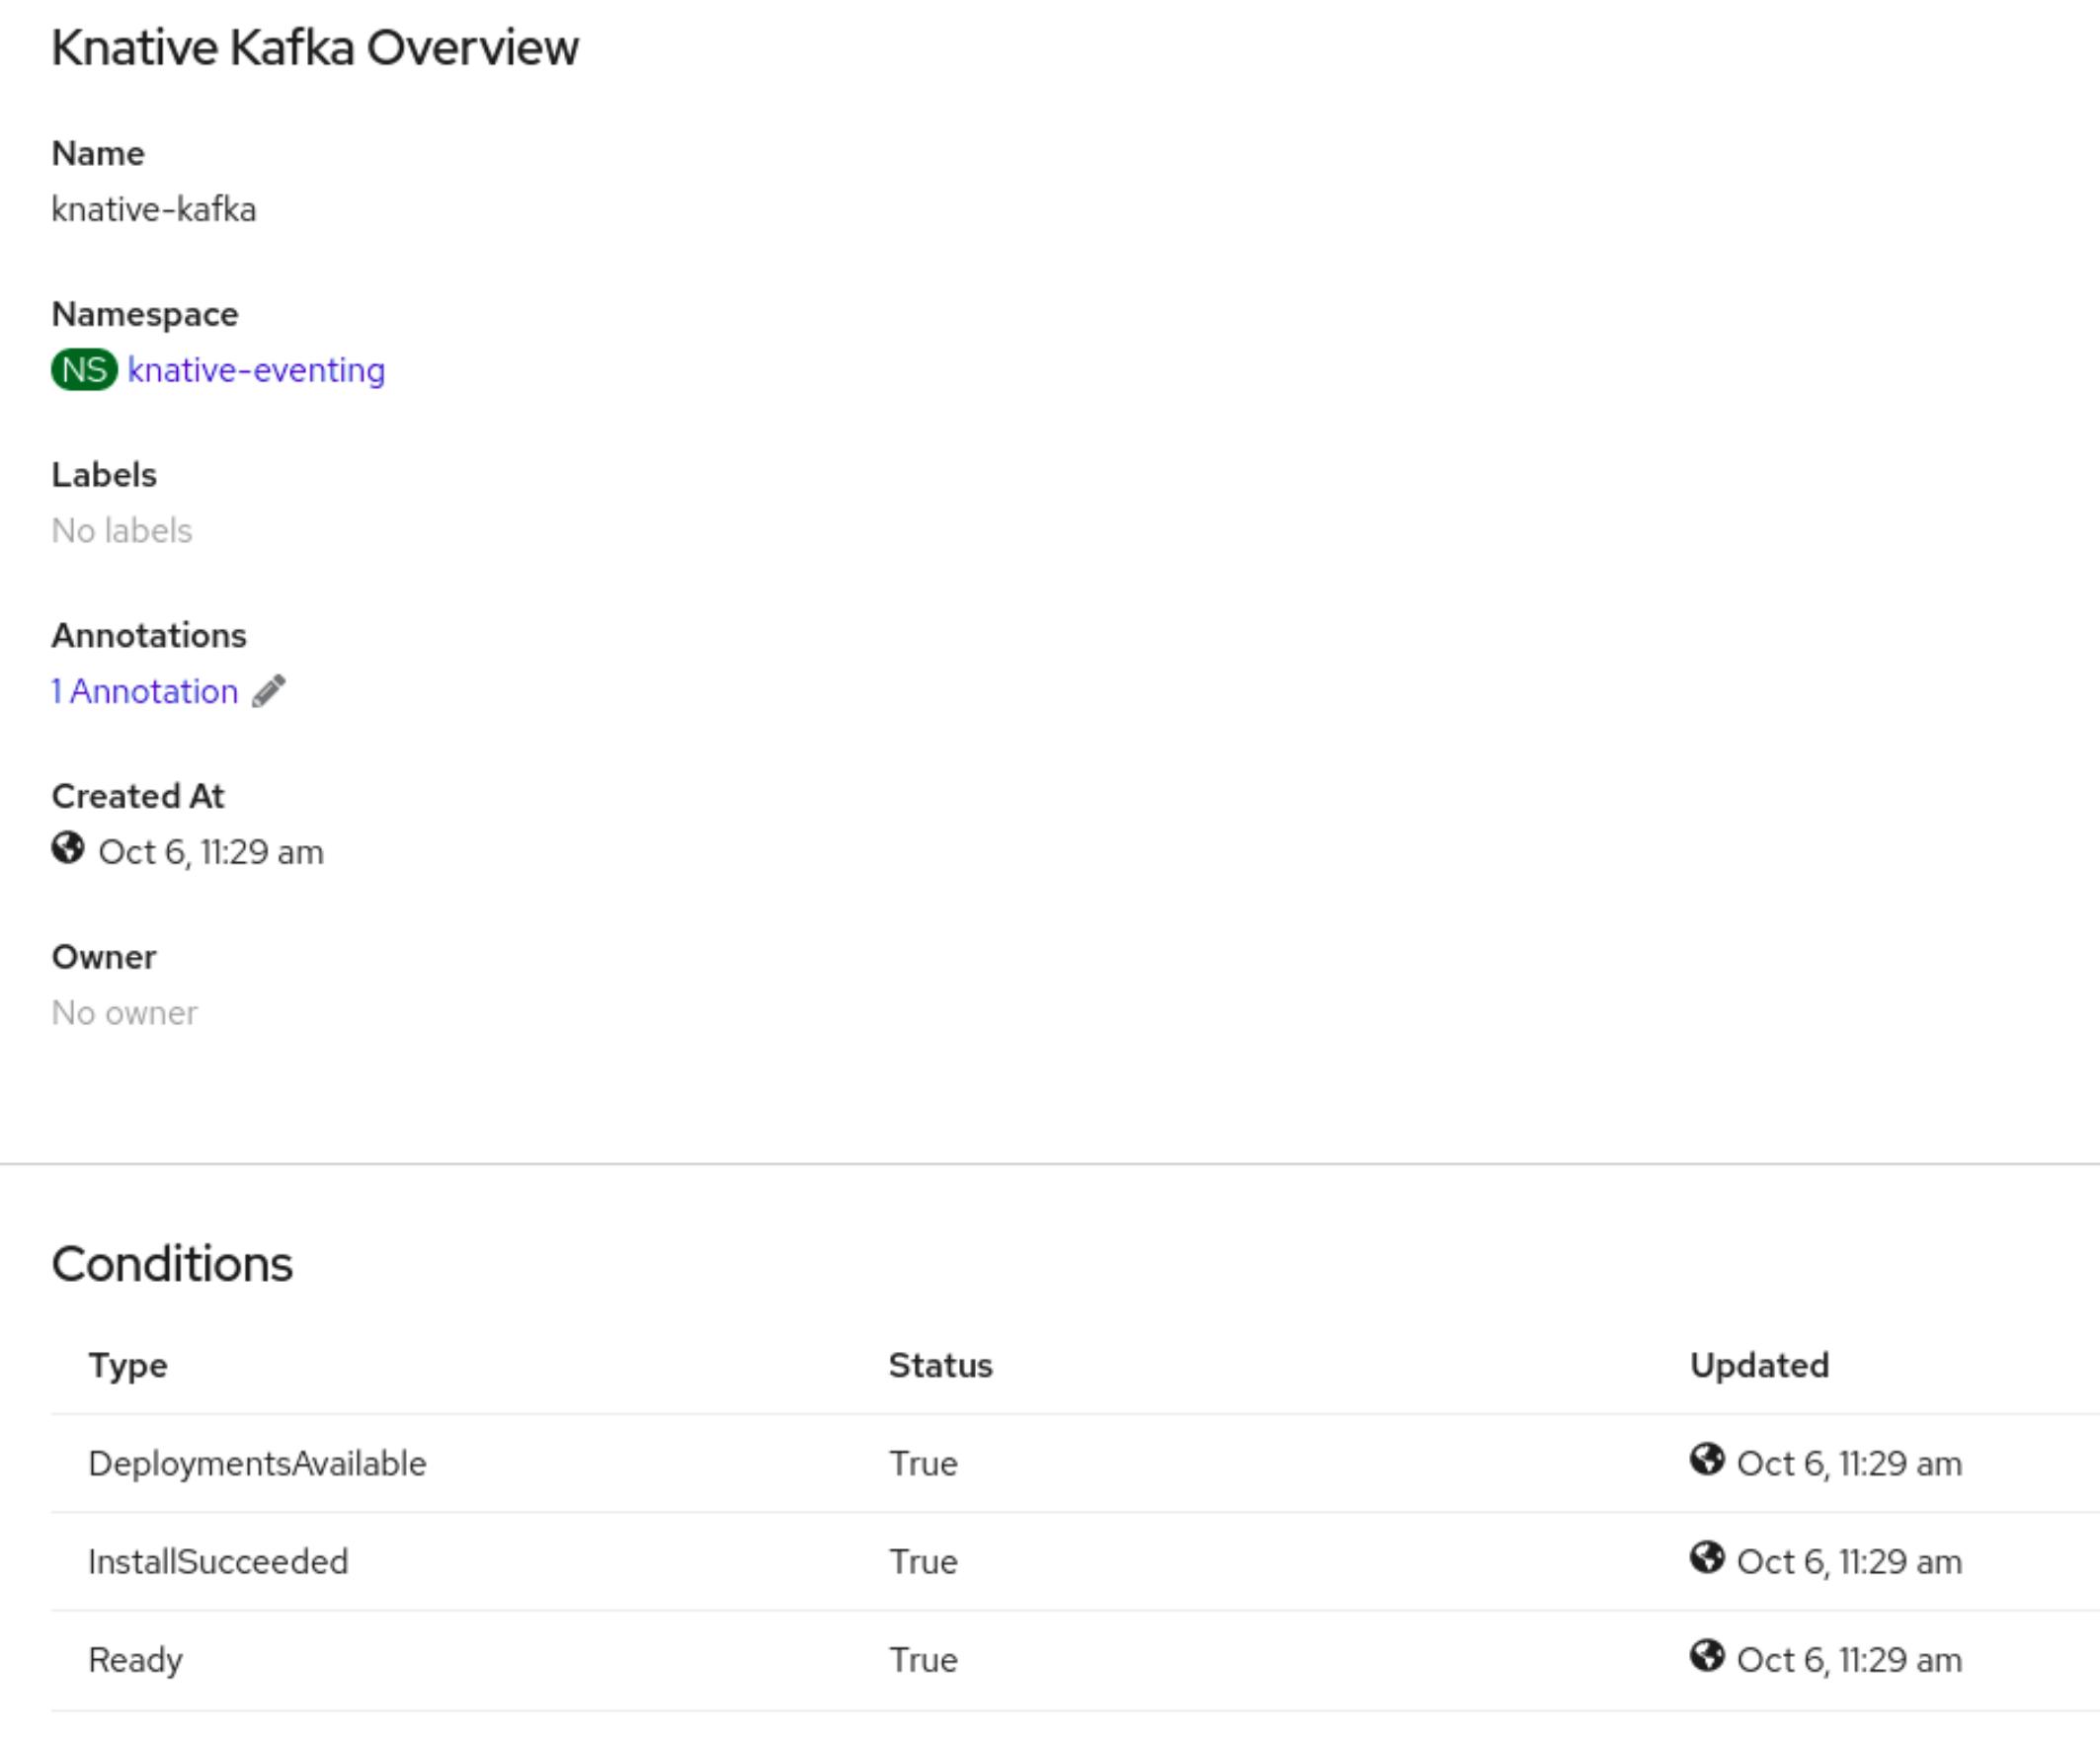 Kafka Knative Overview 页面显示 Conditions